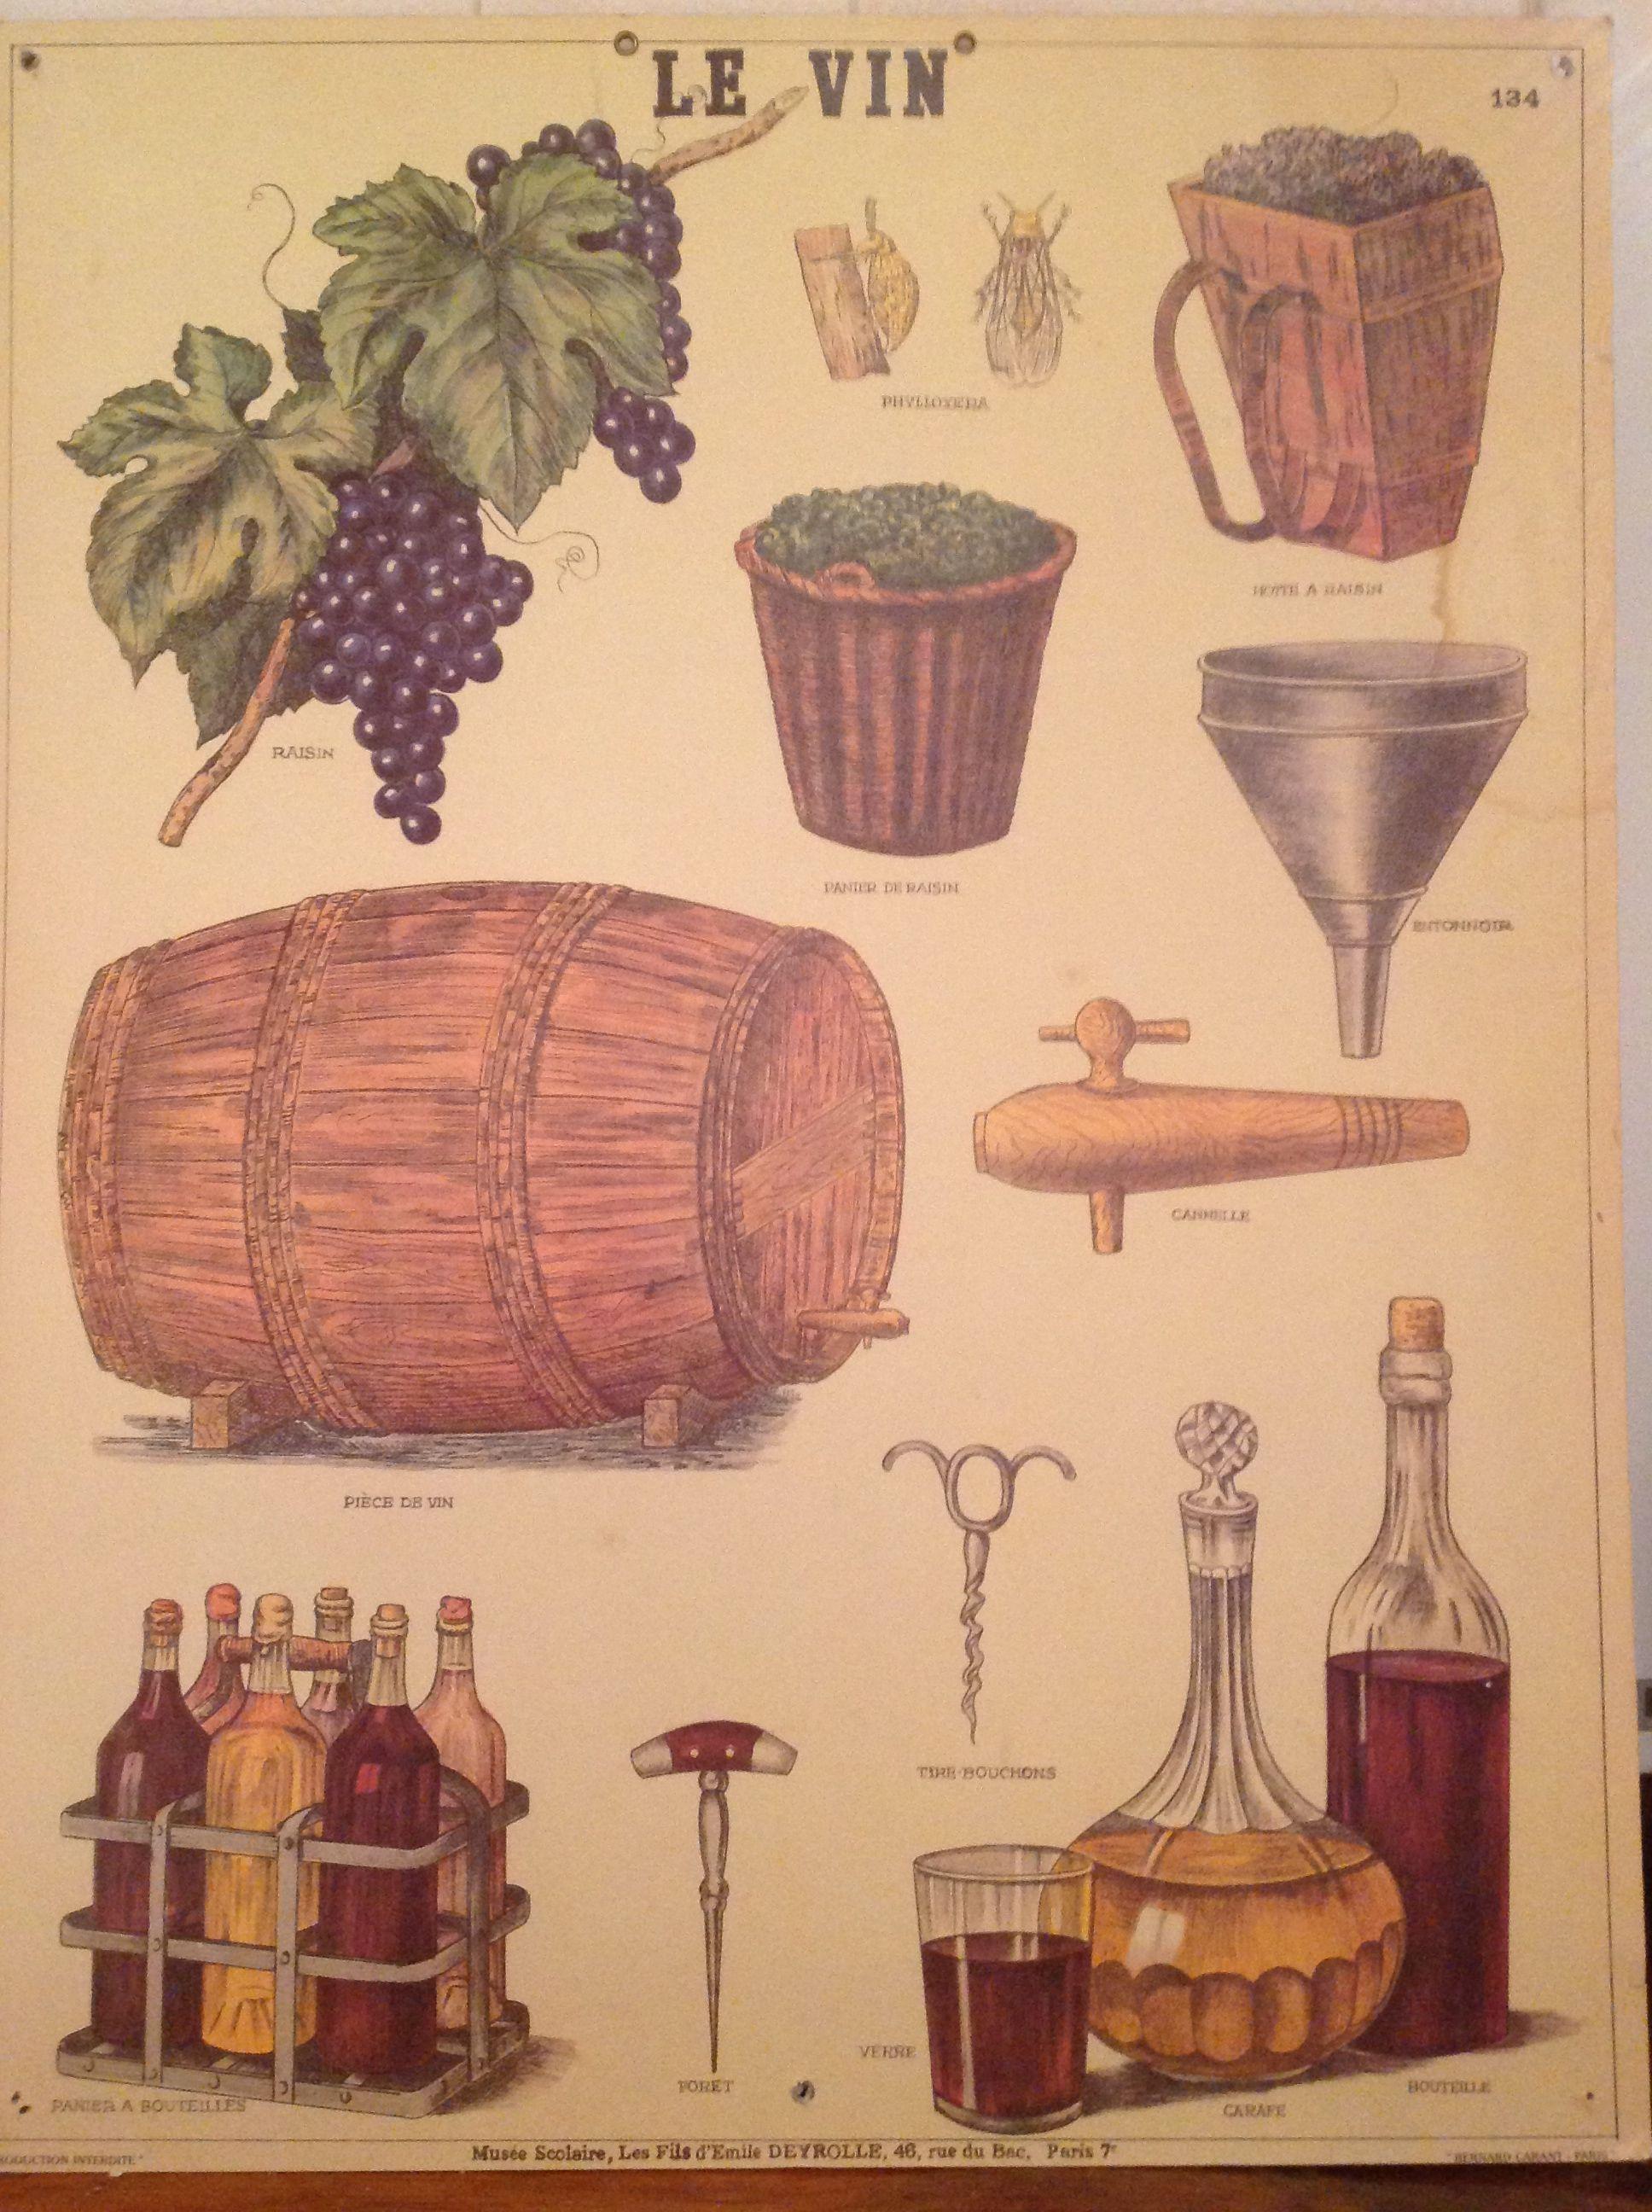 #wine #vintage #poster